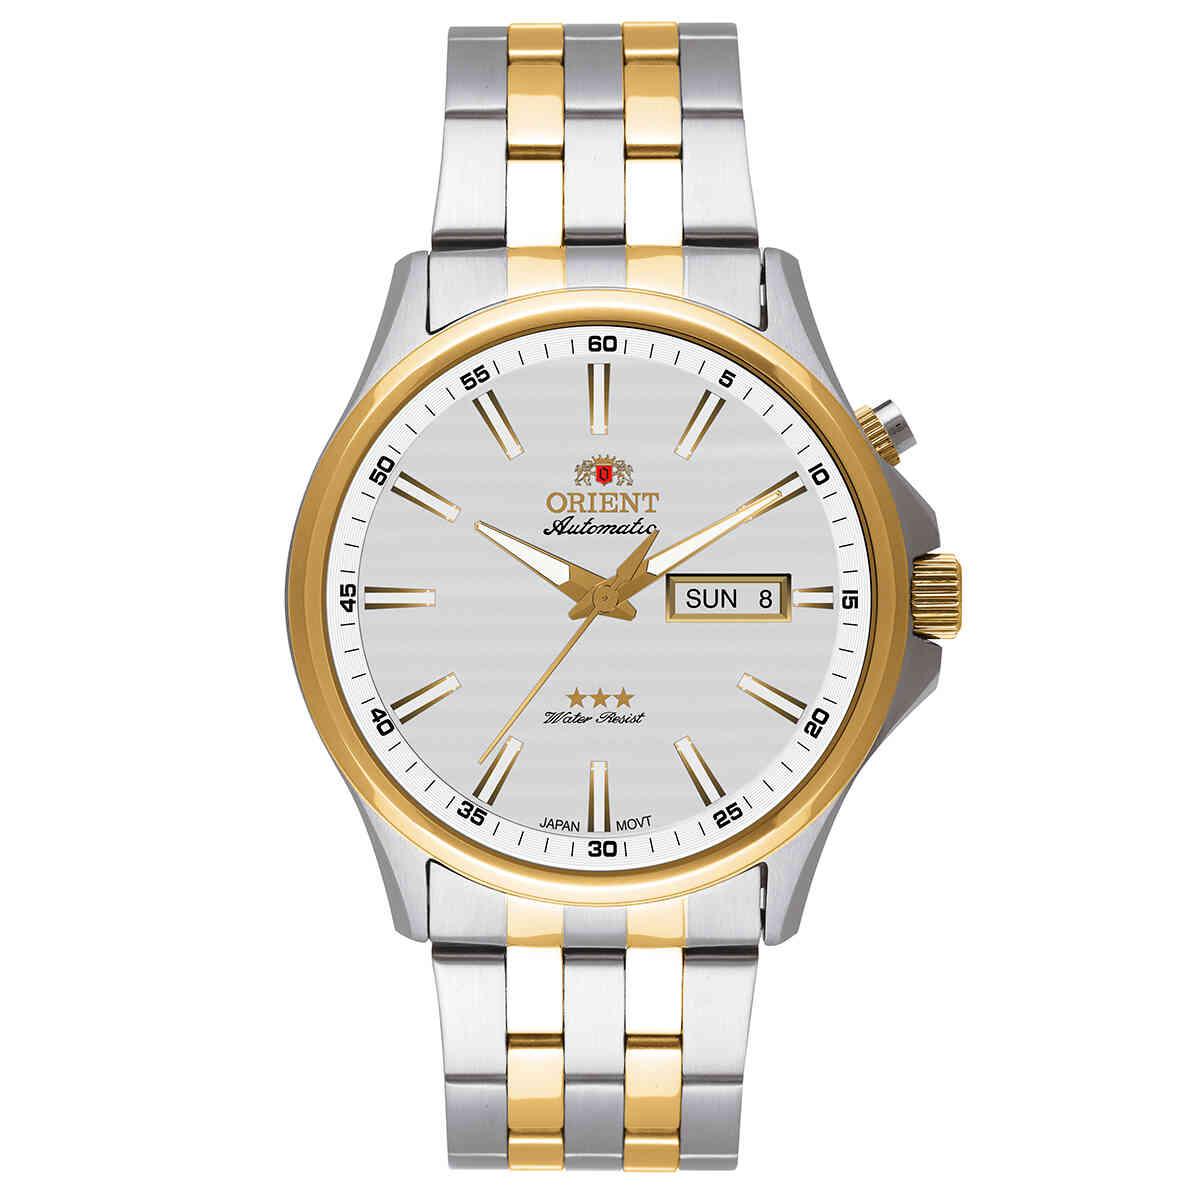 Relógio de Pulso Orient Automático Masculino 469TT043